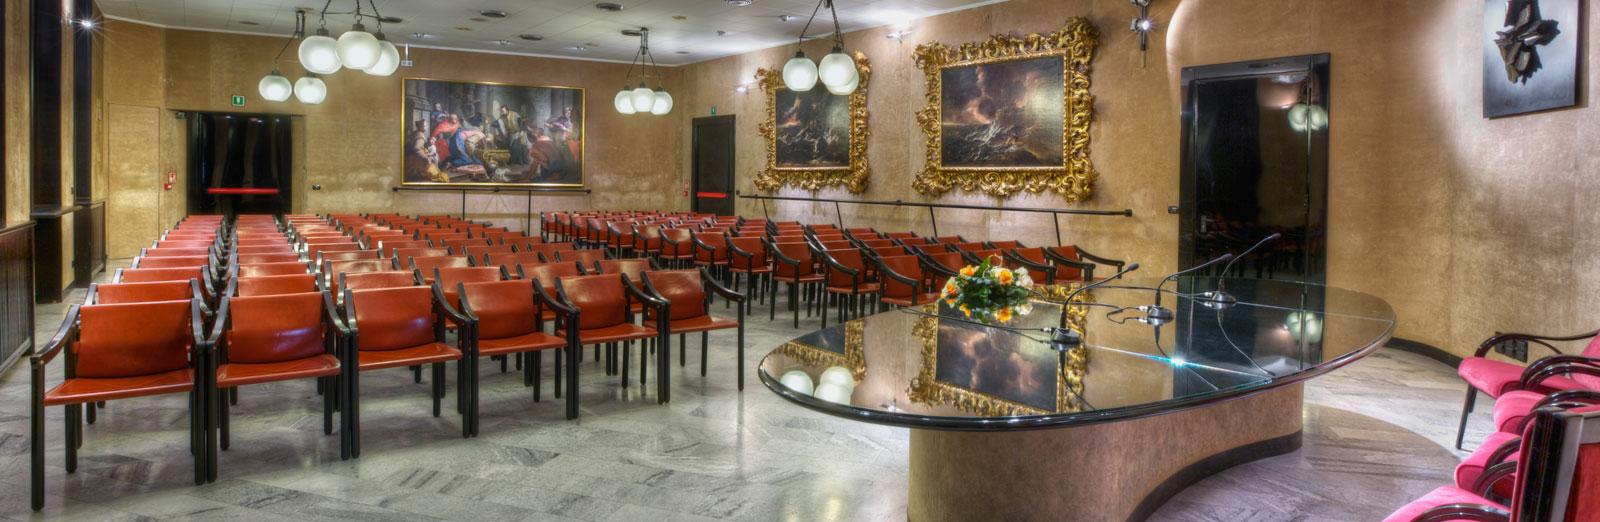 Fabio Besta Conference room